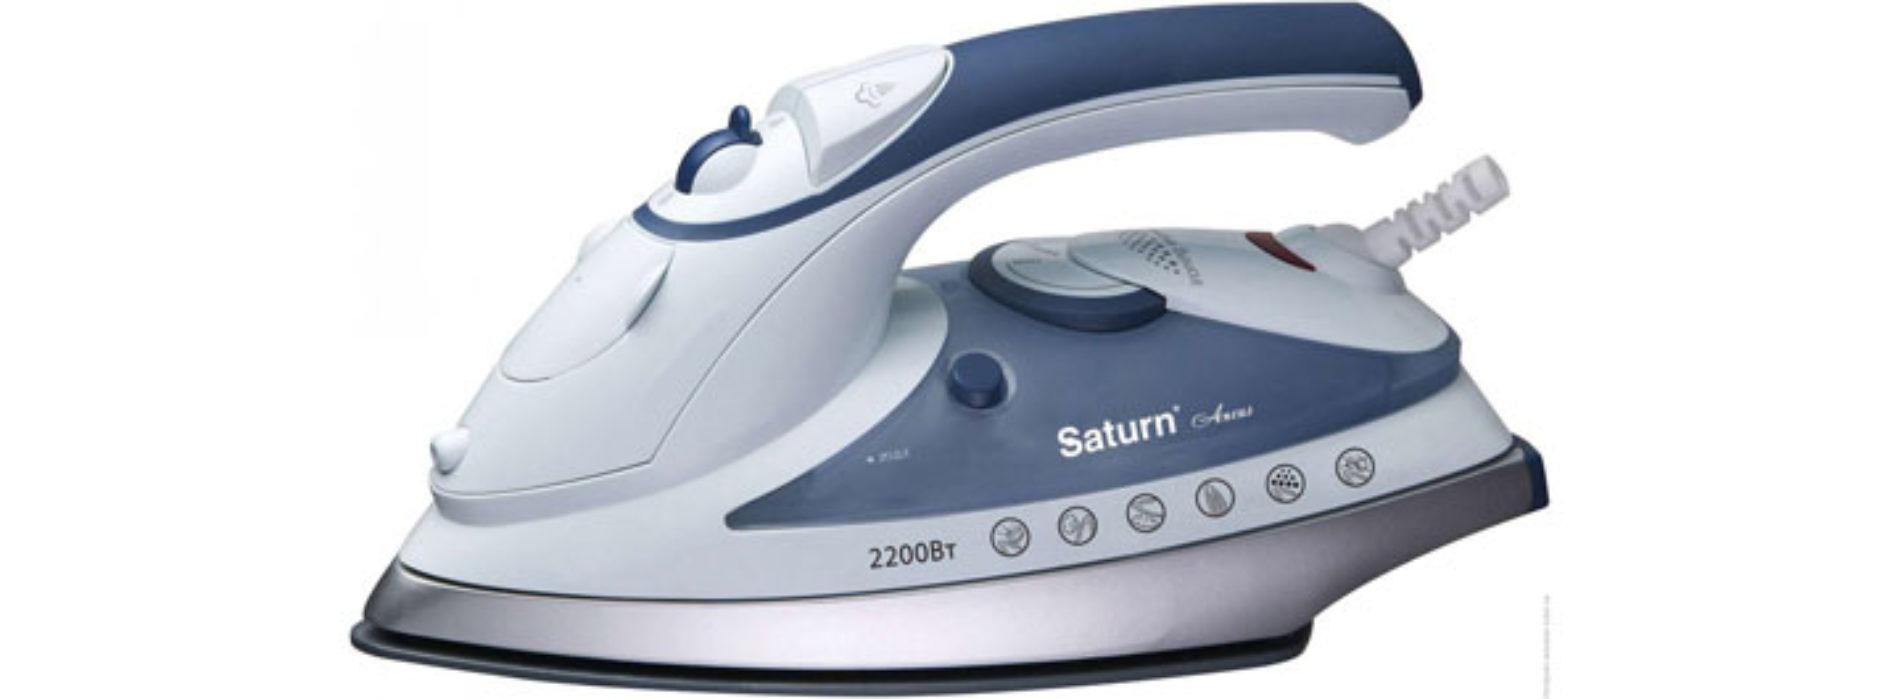 Ремонт утюгов Saturn